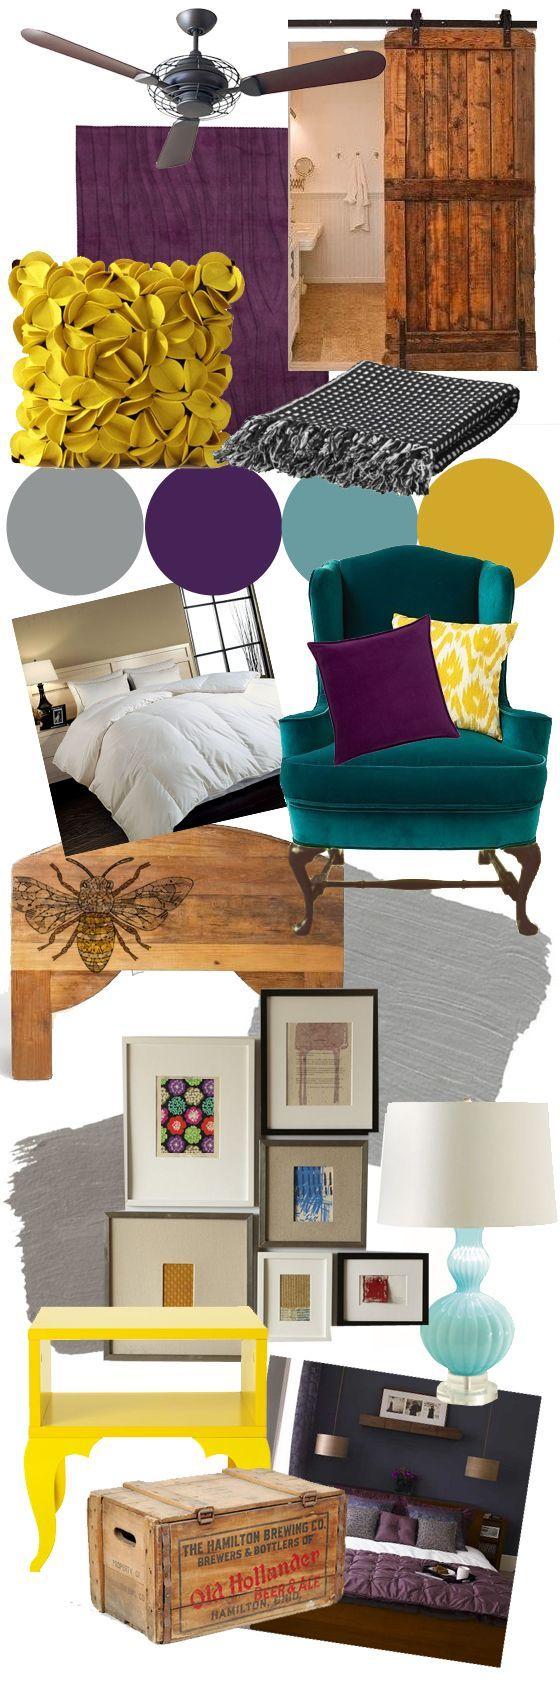 1000 Ideas About Purple Teal Bedroom On Pinterest Purple Palette Purple Color Schemes And